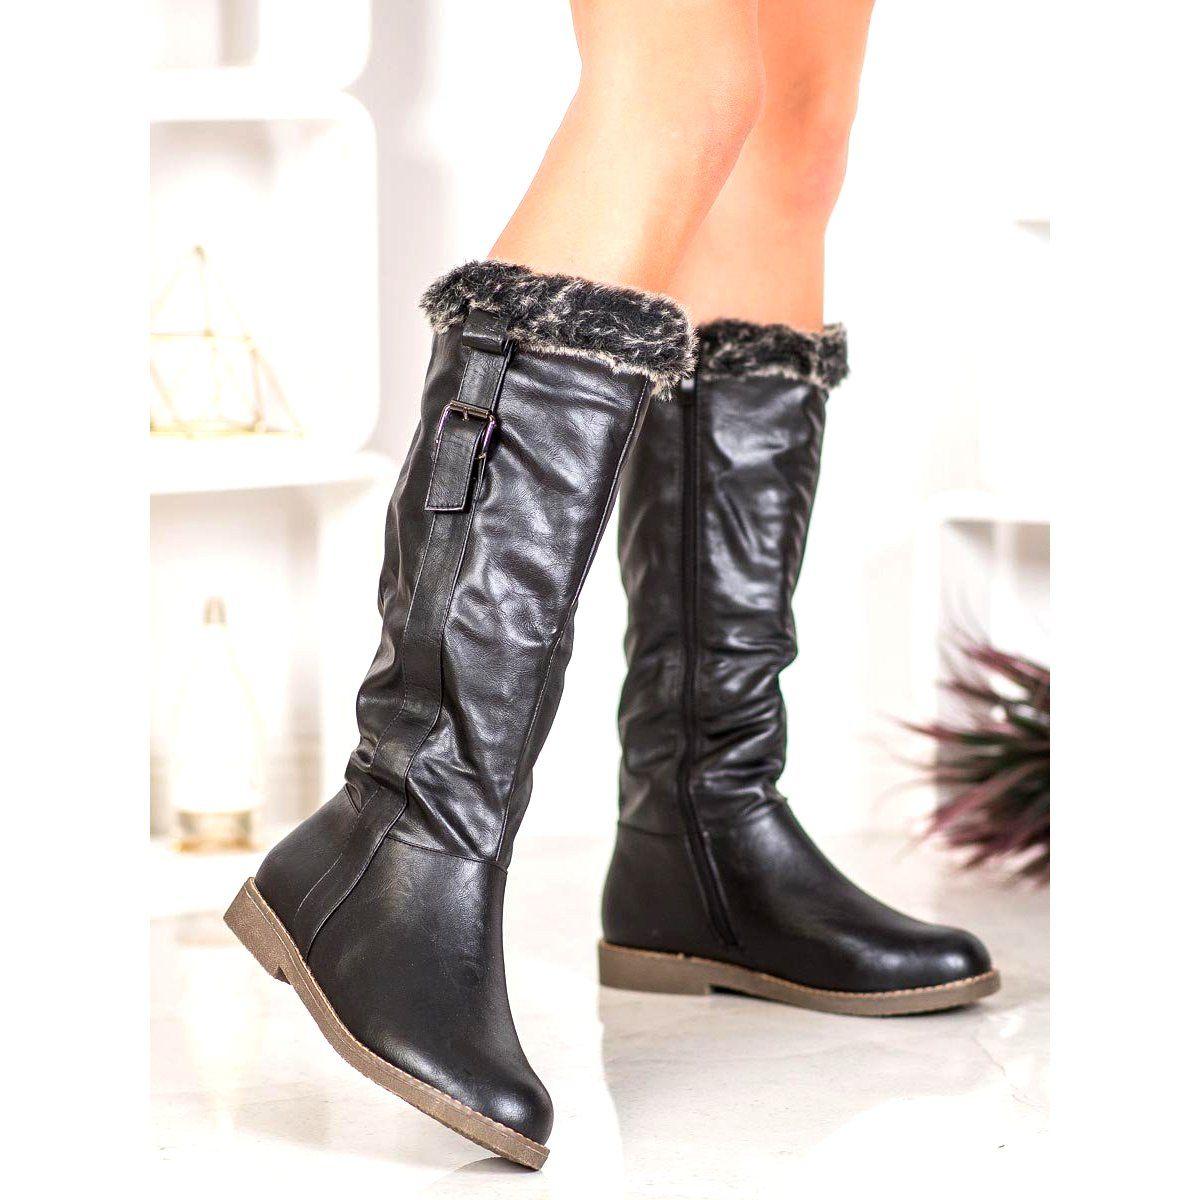 Sergio Leone Kozaki Z Futerkiem Czarne Boots Riding Boots Shoes